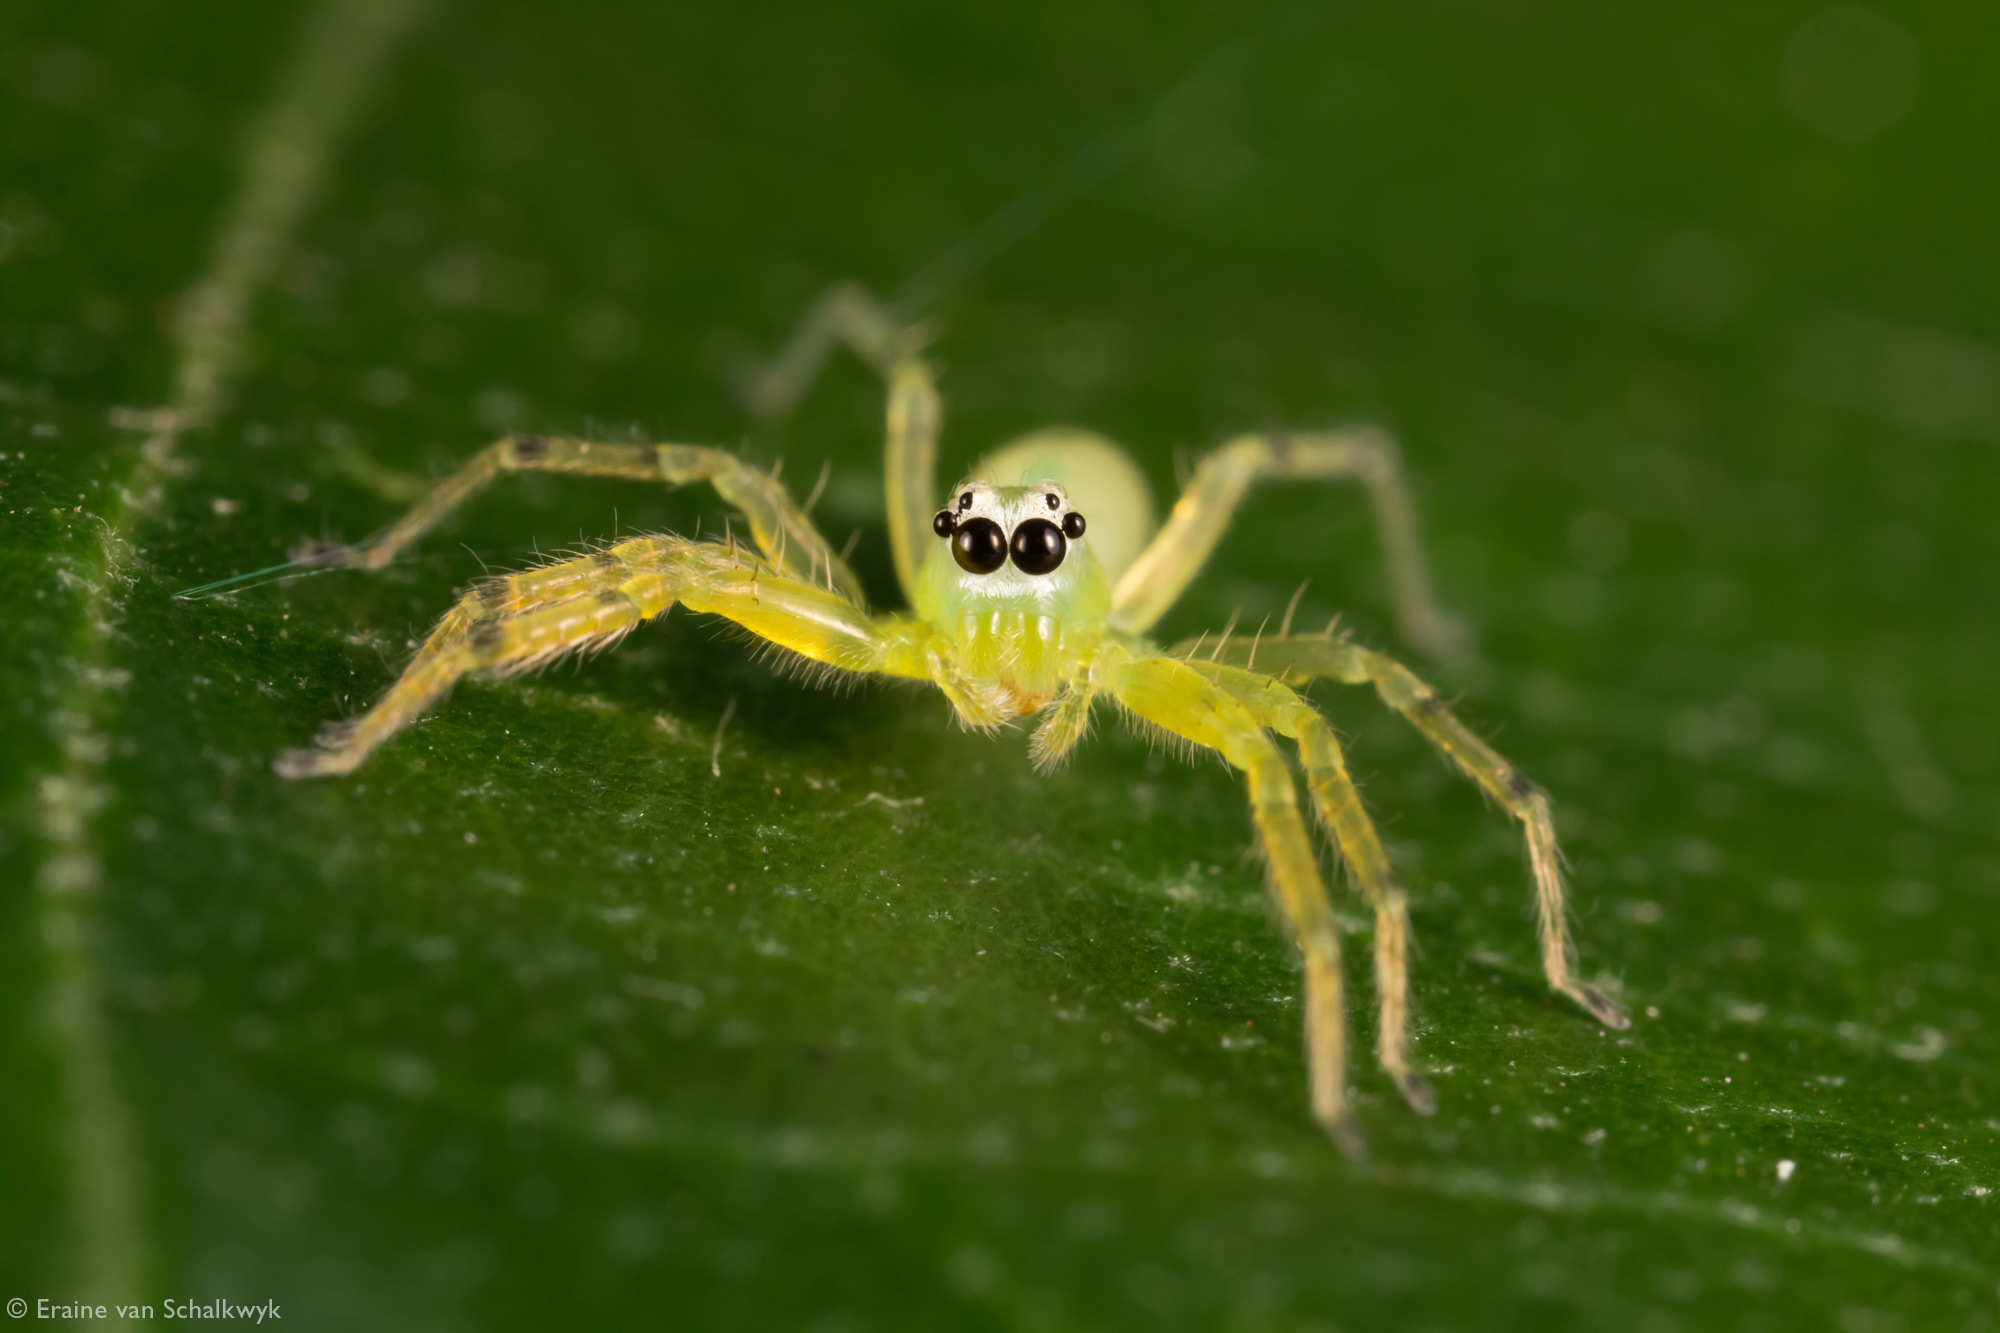 Green jumping spider, spider, arachnid, macro photography